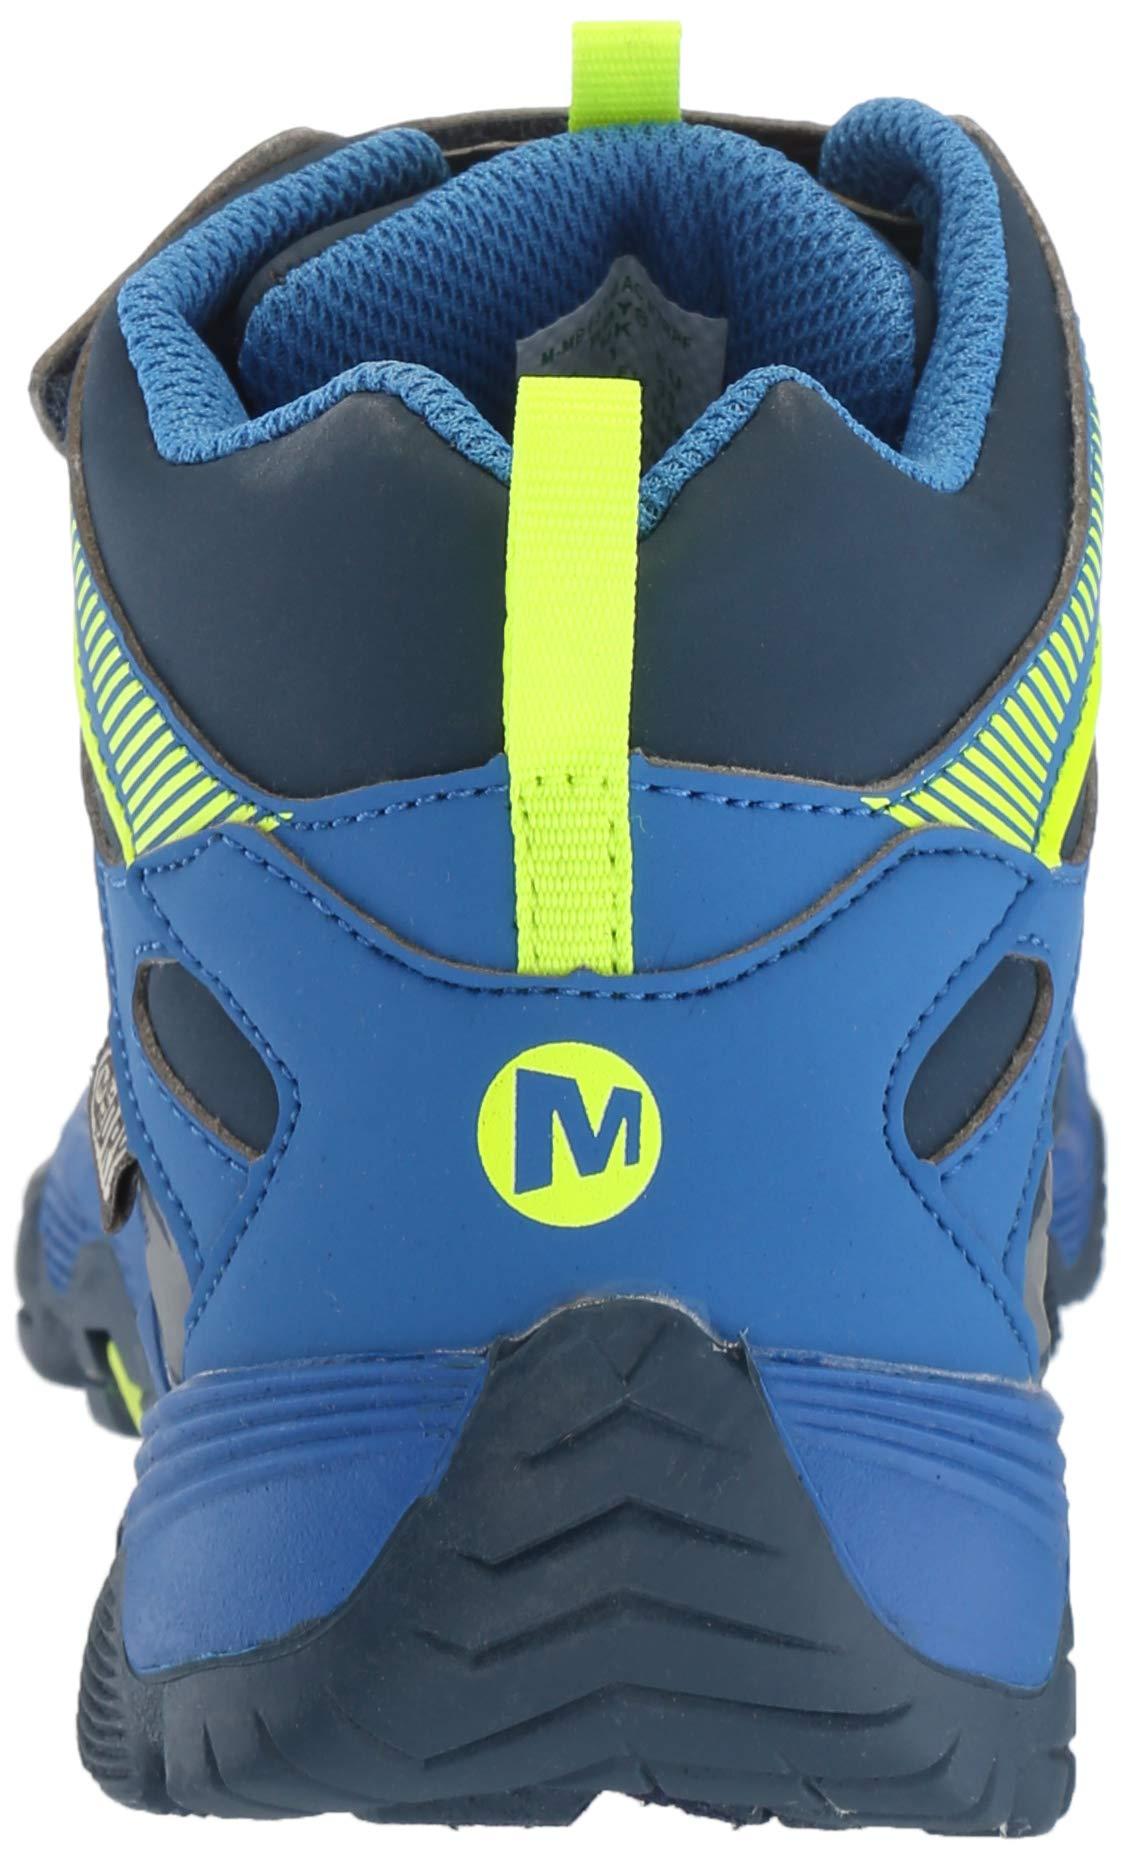 Merrell Boys' Moab FST Mid A/C WTRPF Hiking Shoe, Navy/Cobalt, 6 Medium US Big Kid by Merrell (Image #2)